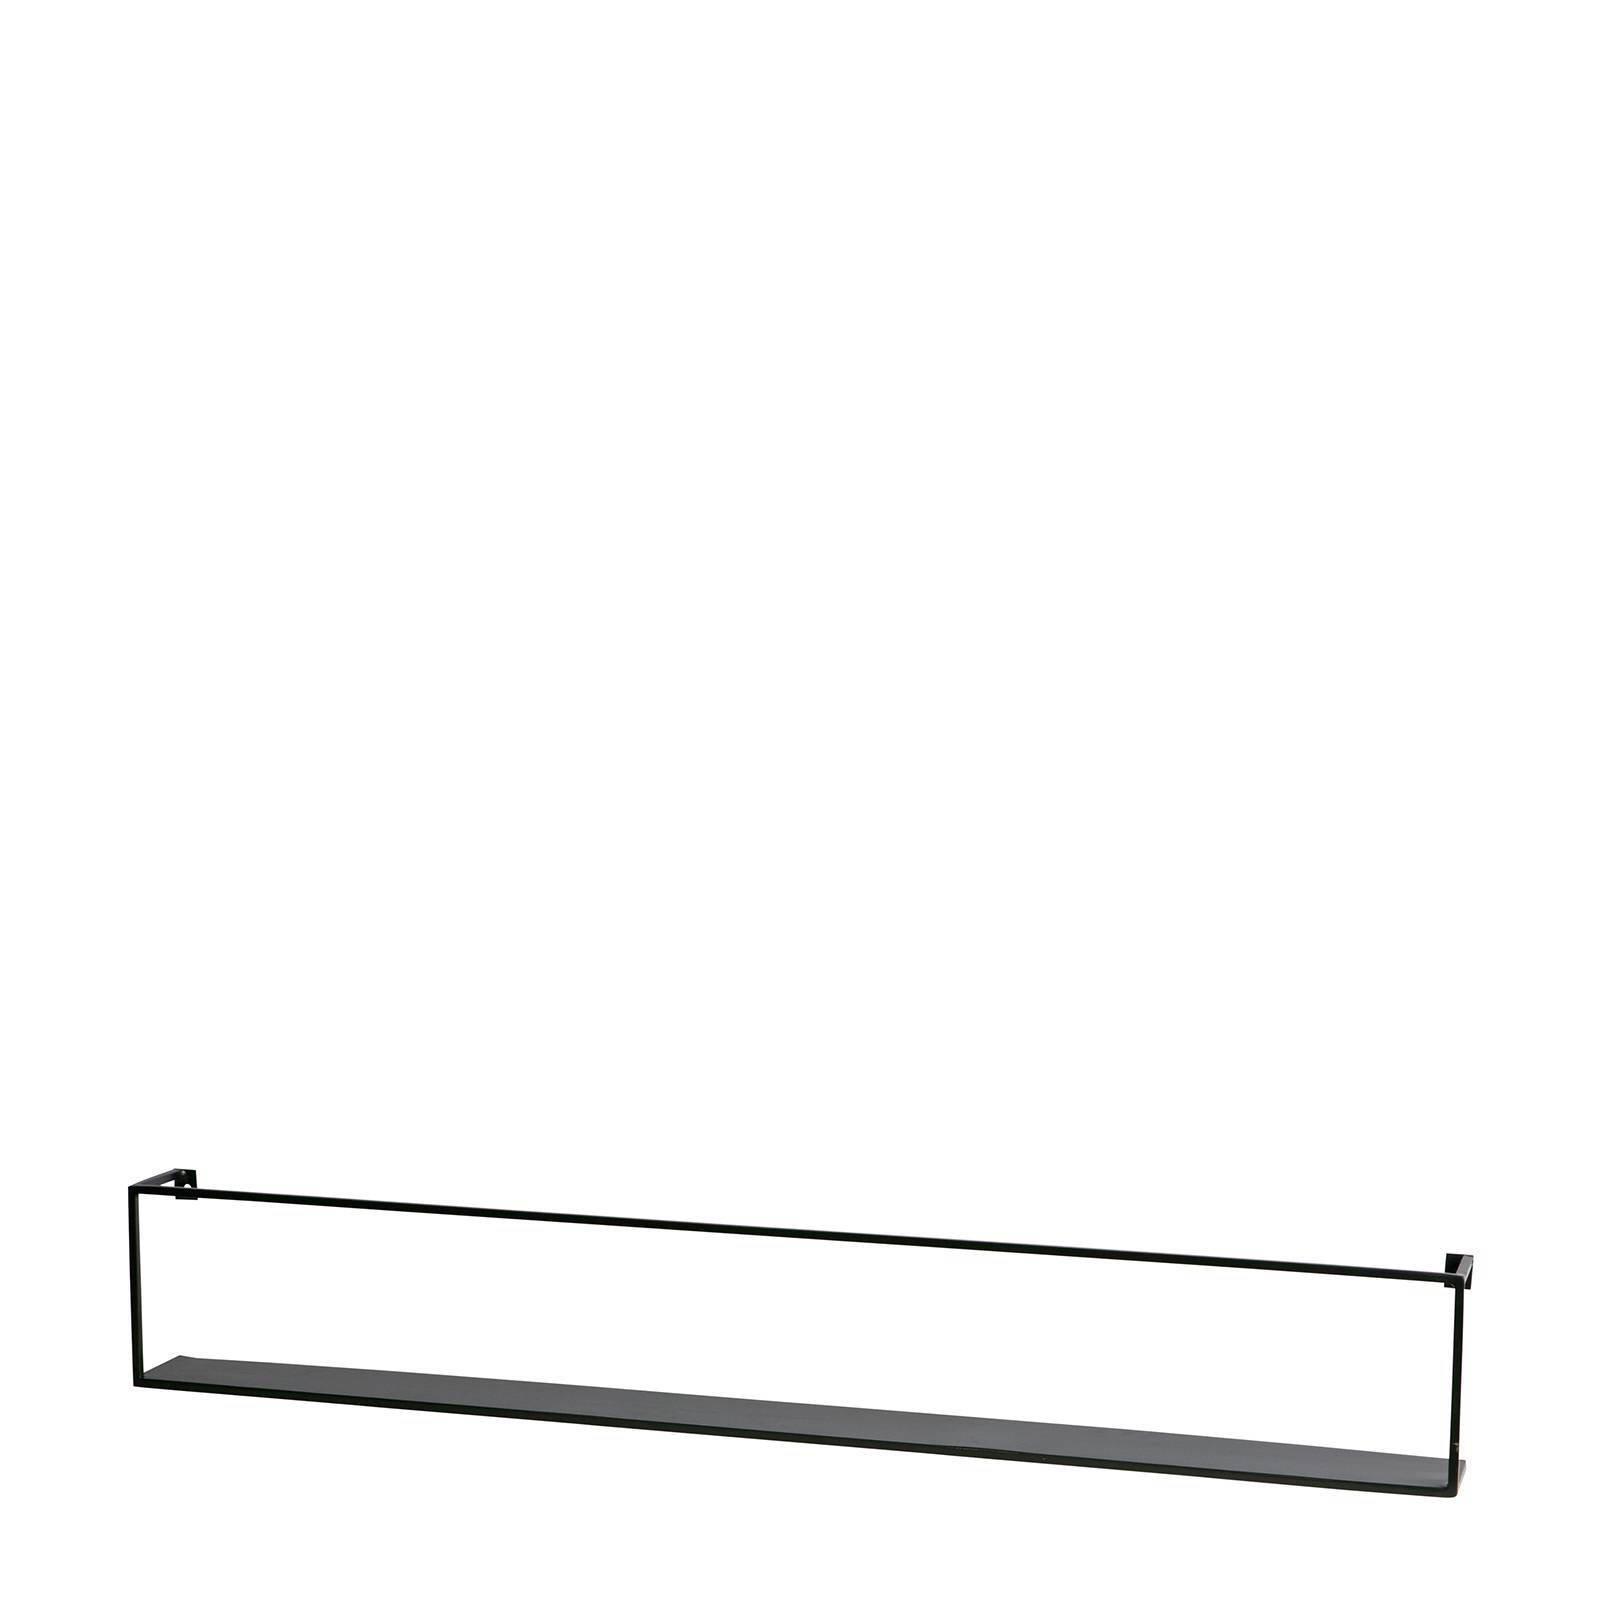 Wandplank 100 Cm.Woood Wandplank Meert 100cm Wehkamp